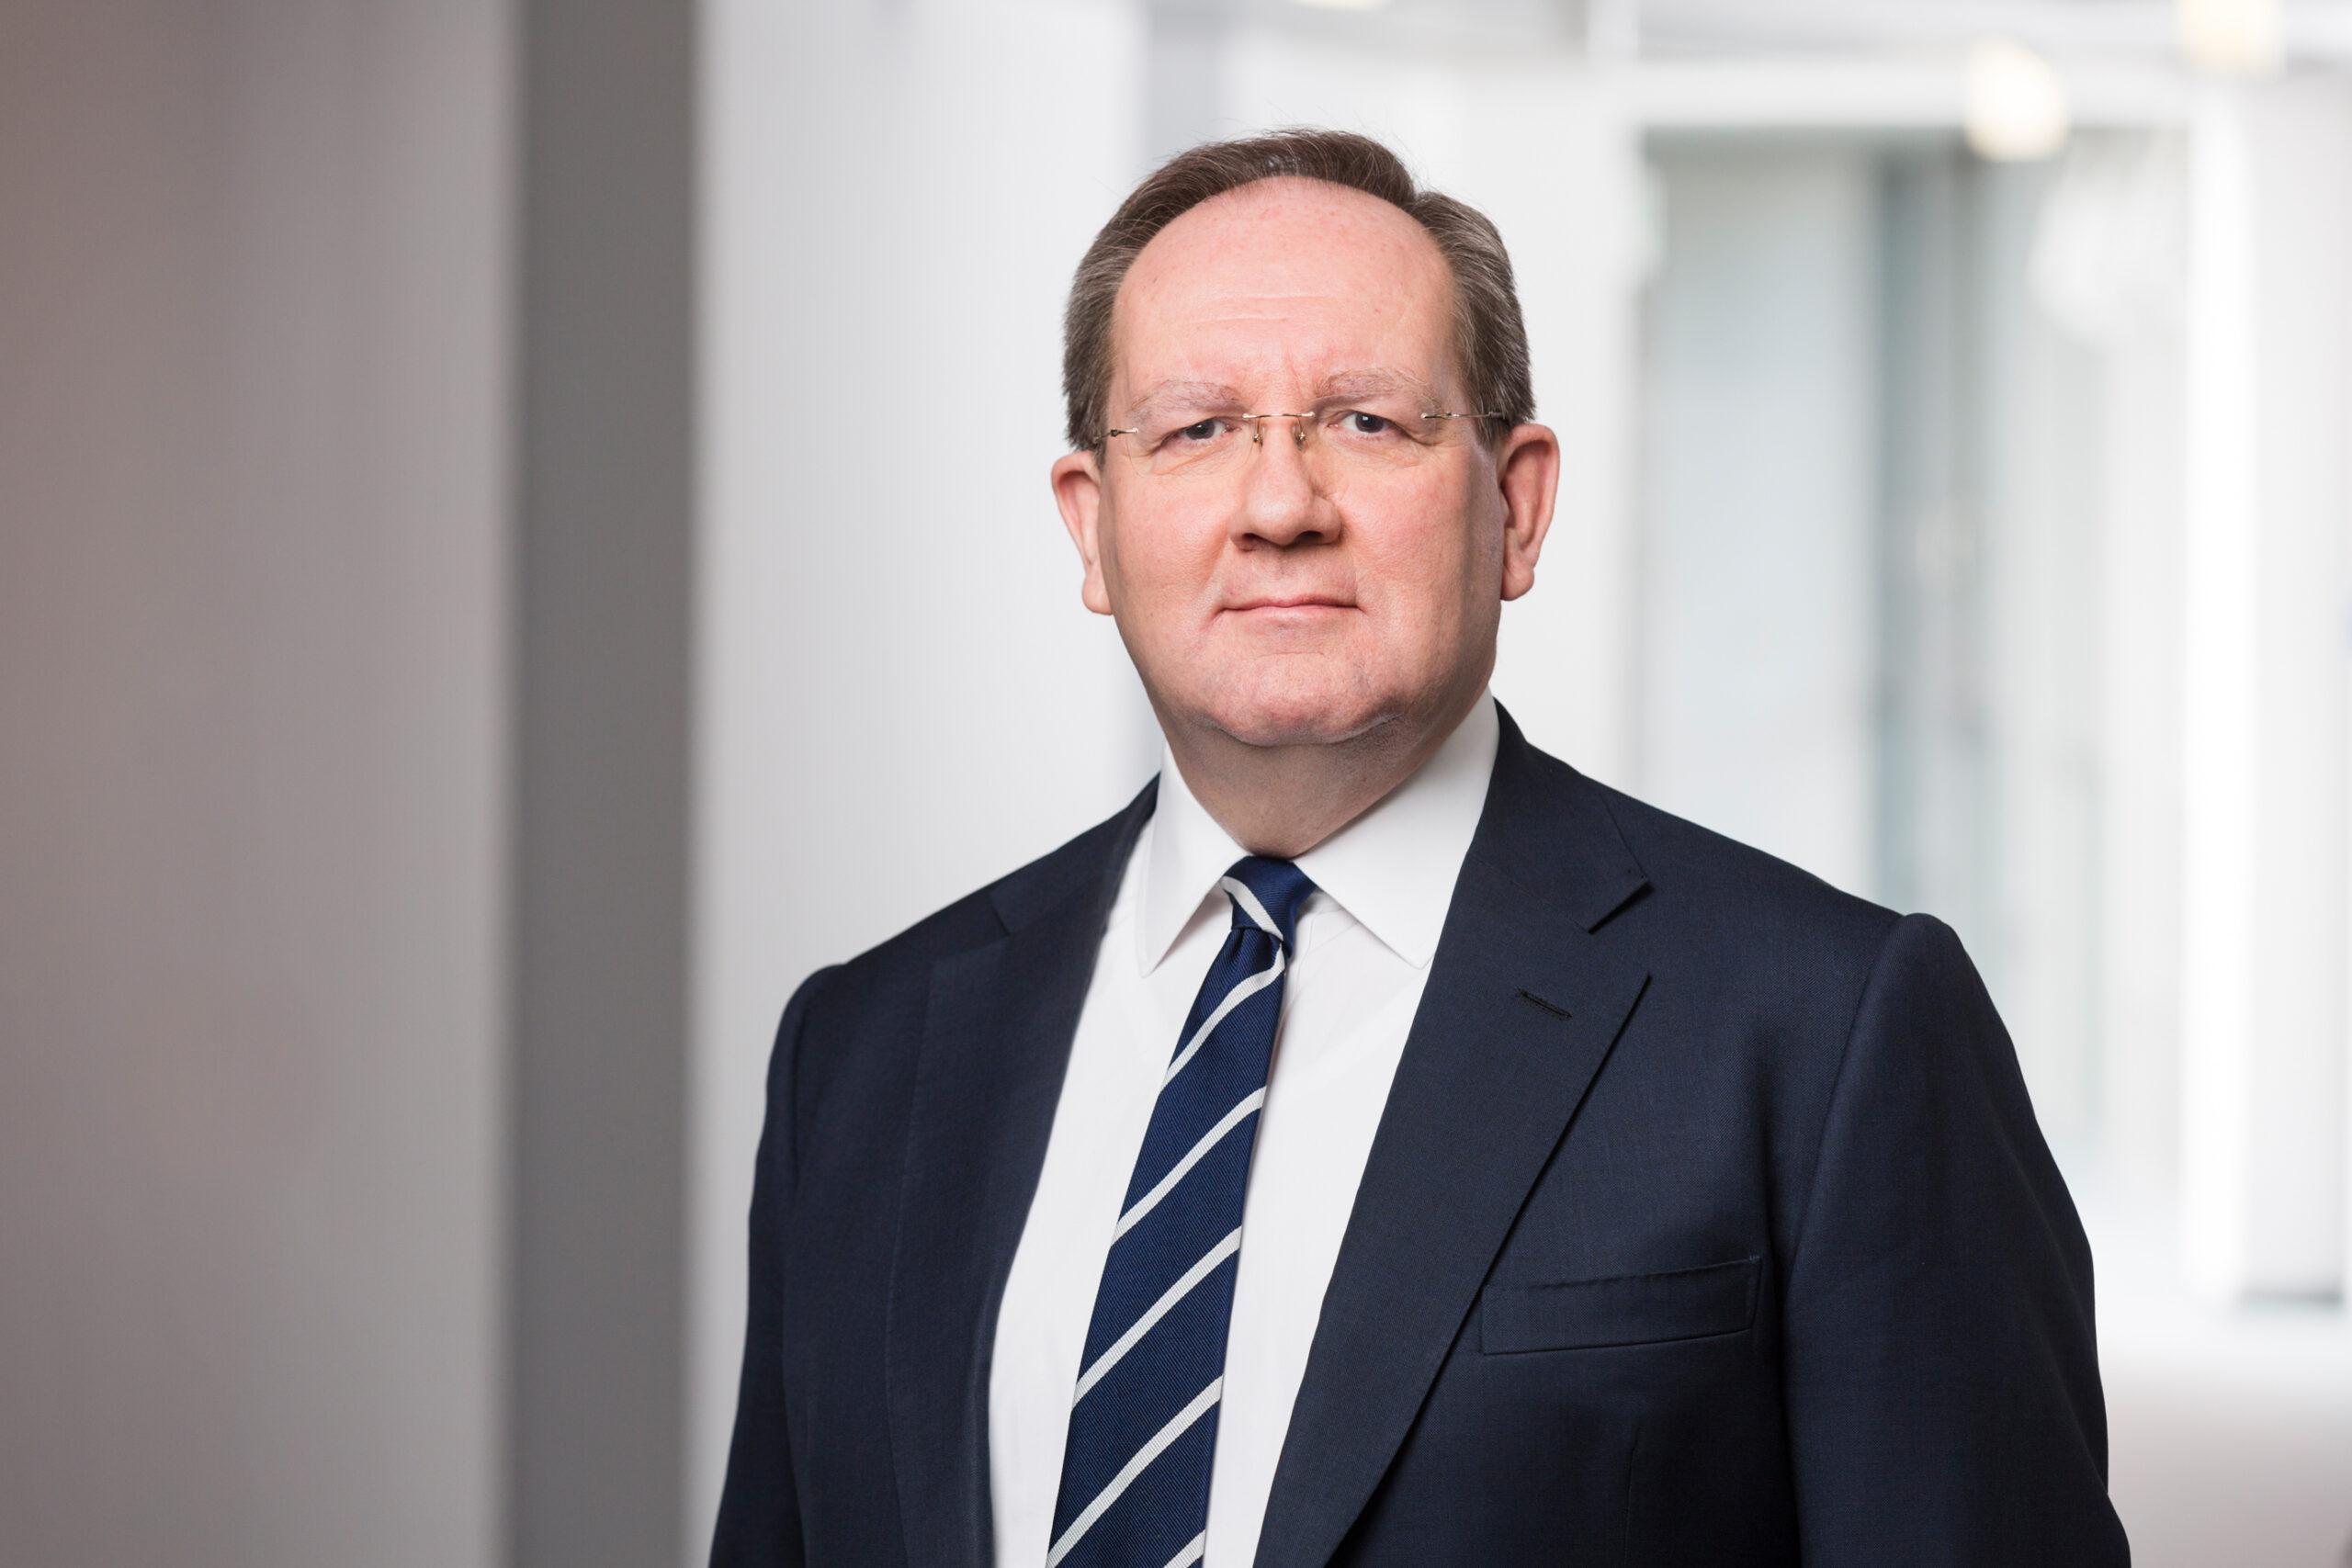 Bafin-Präsident Felix Hufeld, Photo: © Bernd Roselieb